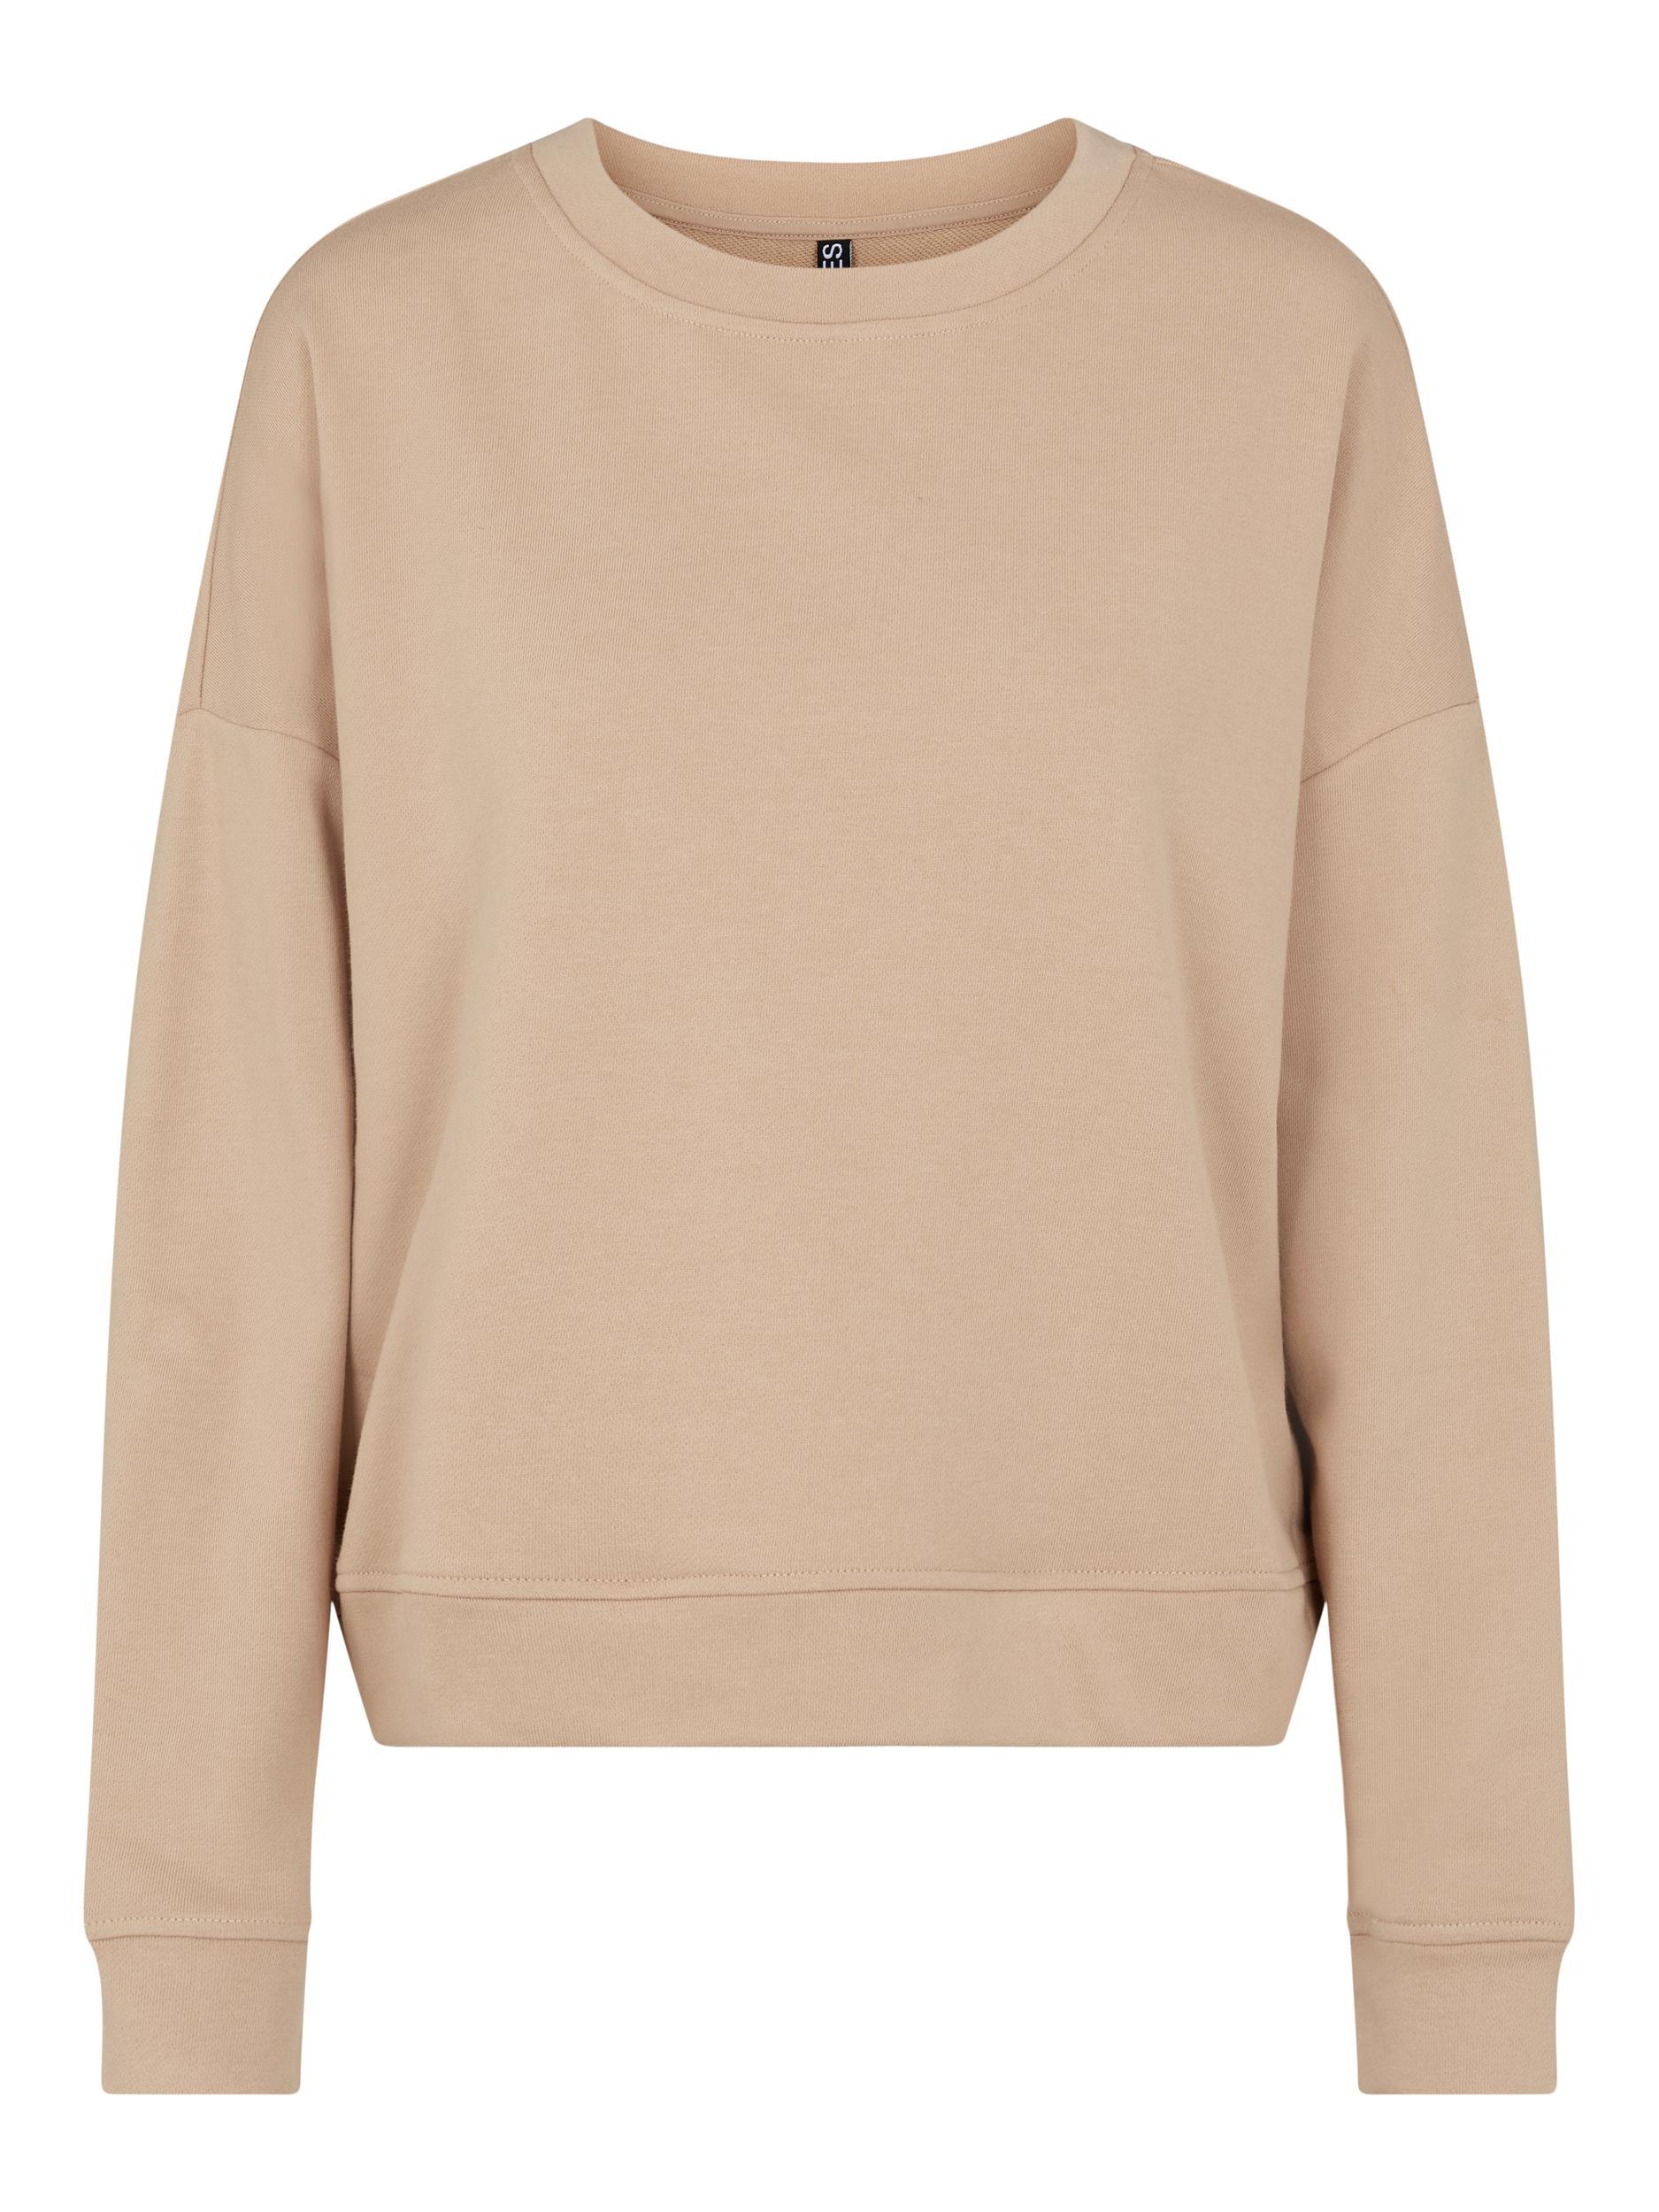 Pieces Chilli Summer sweatshirt, cuban sand, medium